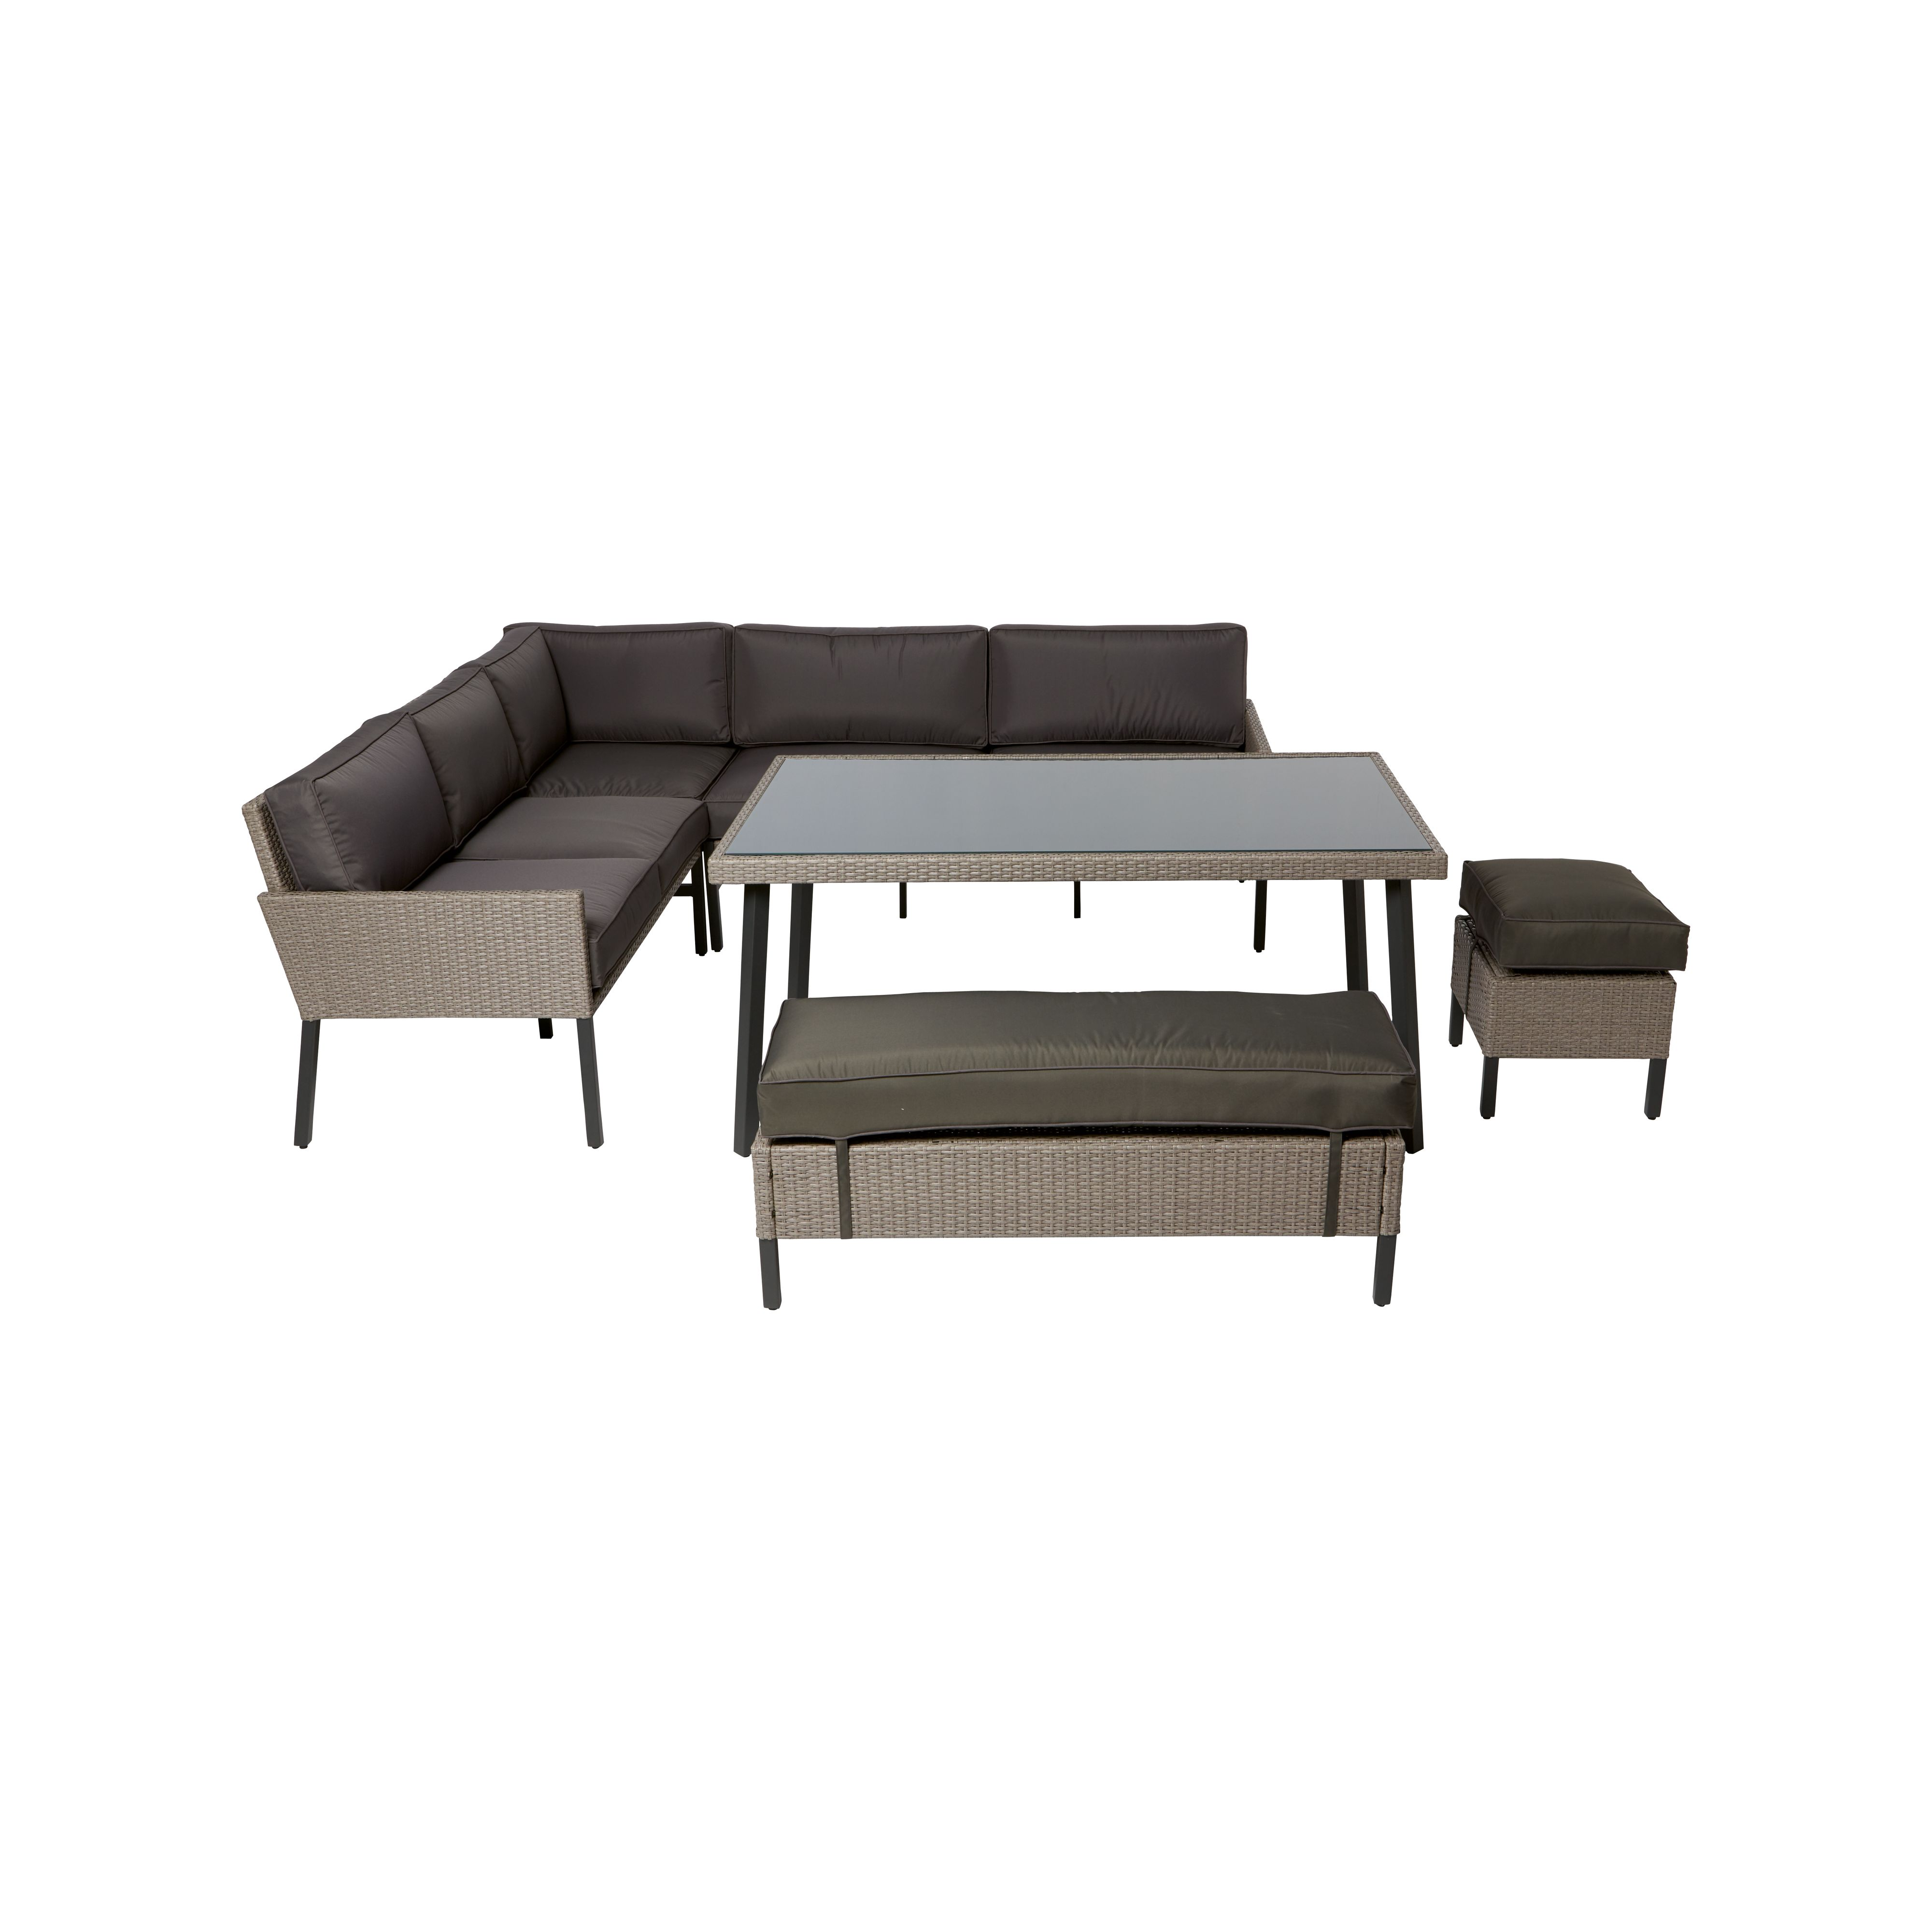 Palermo Rattan Effect Corner Sofa Set